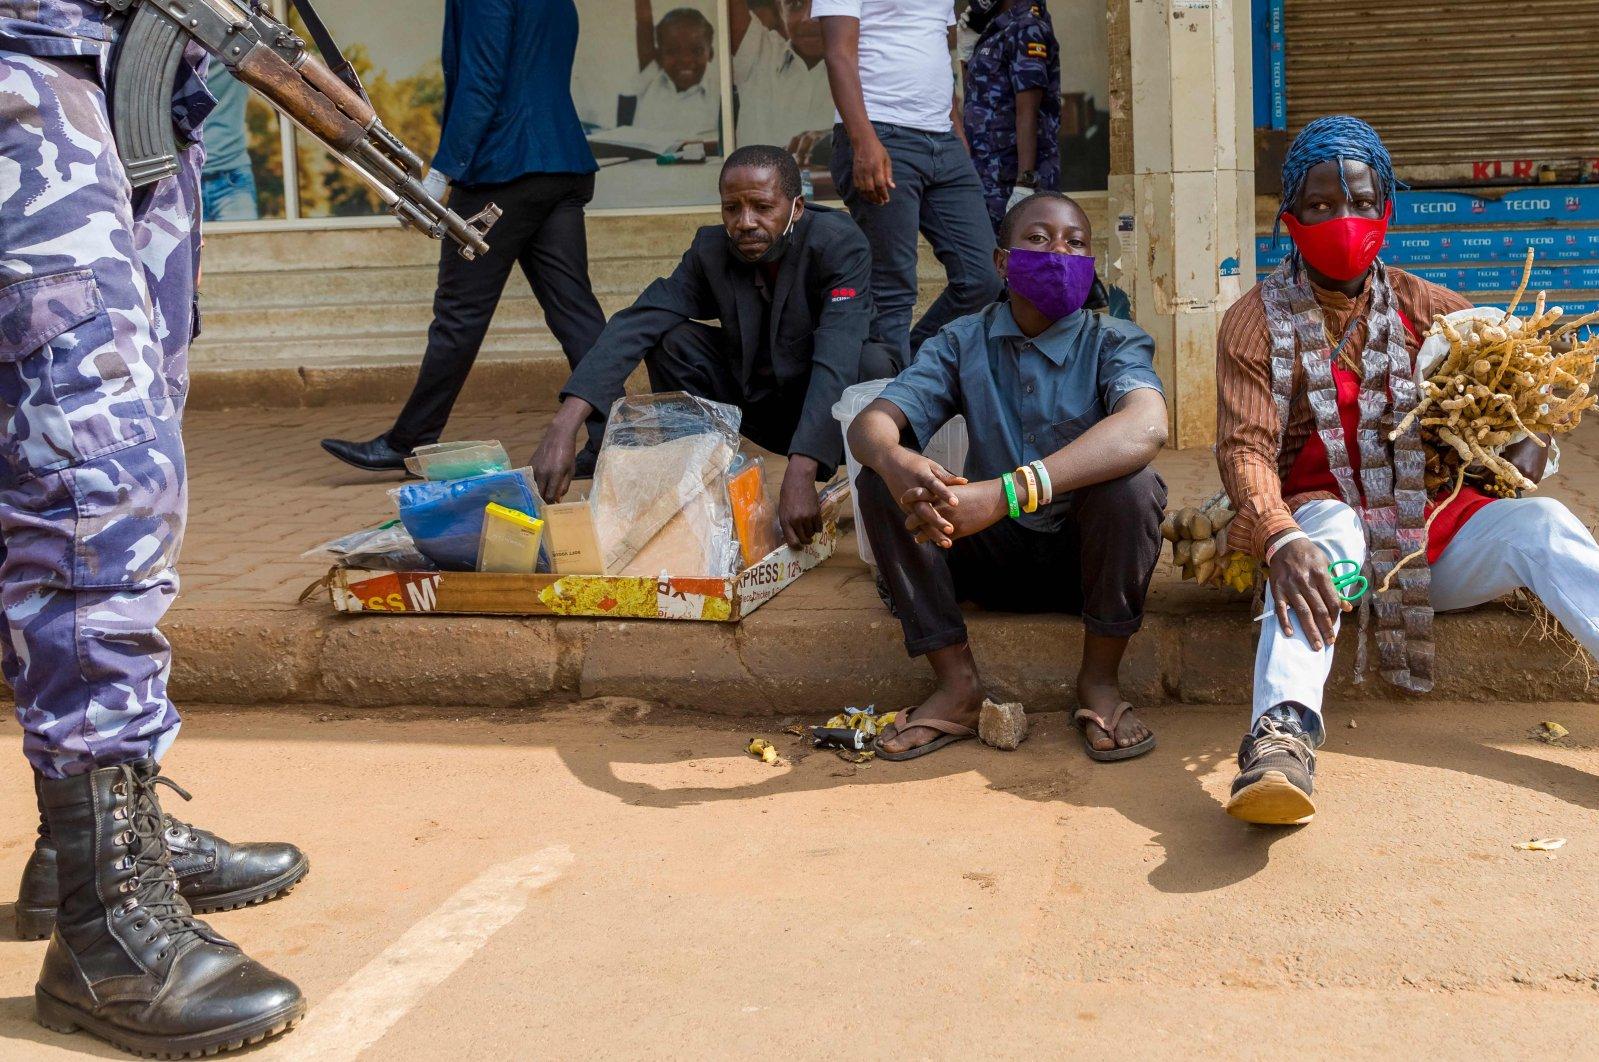 Police officers arrest vendors amid heightened patrols to enforce new COVID-19 lockdown restrictions, Kampala, Uganda, June 25, 2021. (AFP Photo)